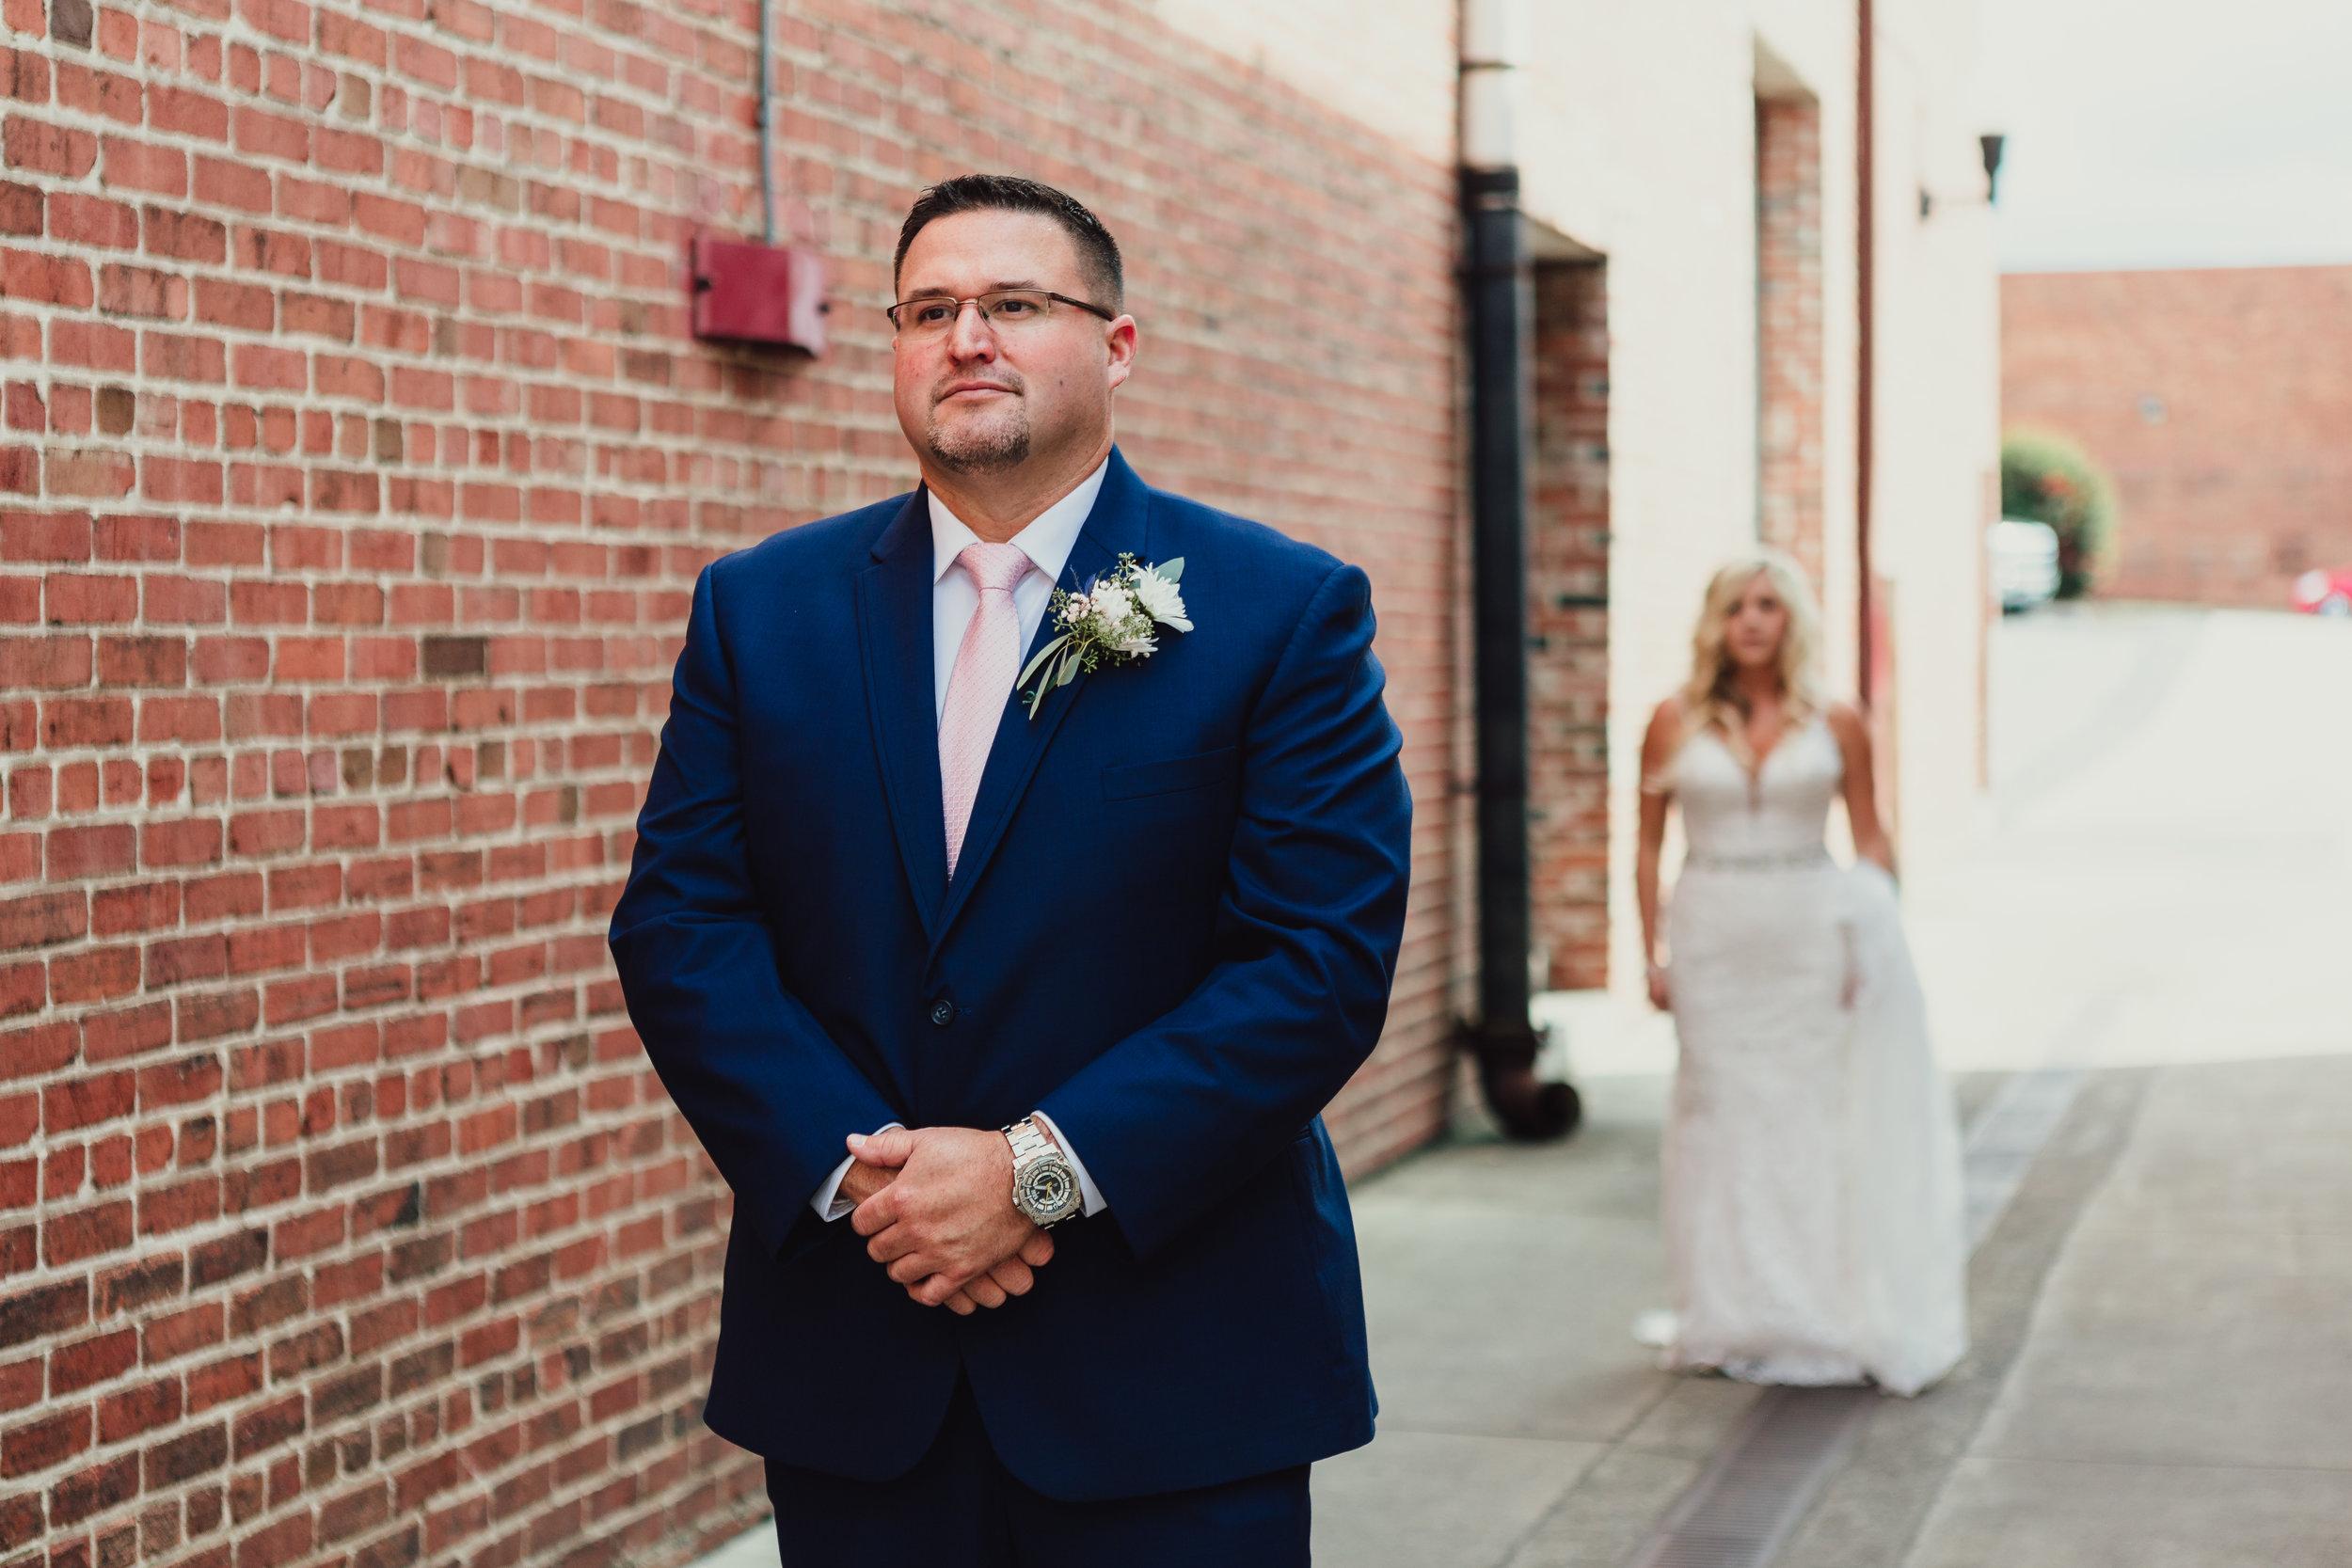 east-tn-wedding-photographer-tennessee-elopement-photographer-kingsport-tn-wedding-photographer (348 of 1001).jpg